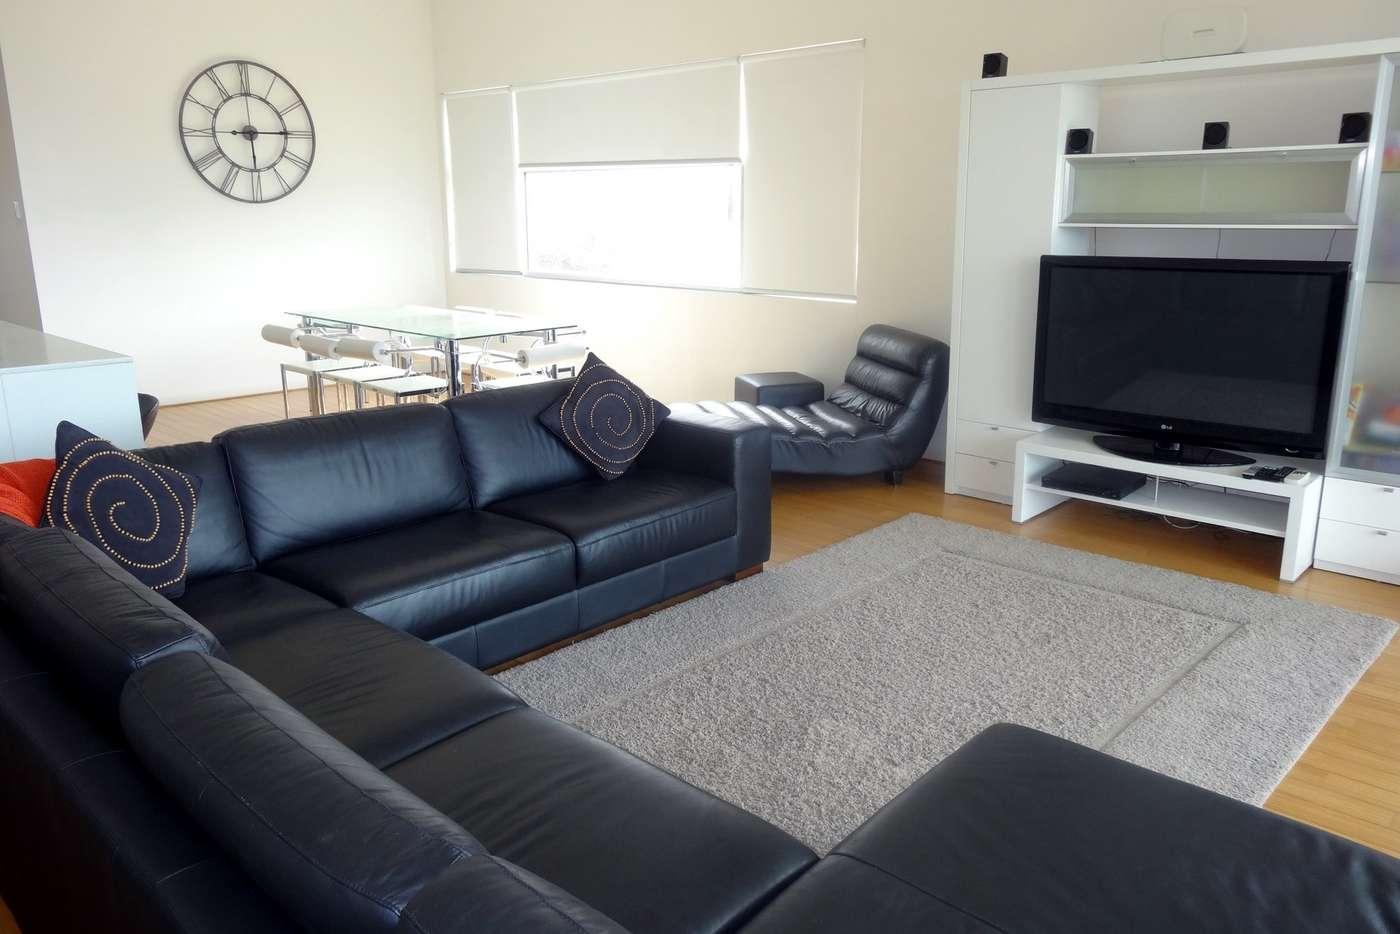 Main view of Homely house listing, 47 Battye Rd, Encounter Bay SA 5211